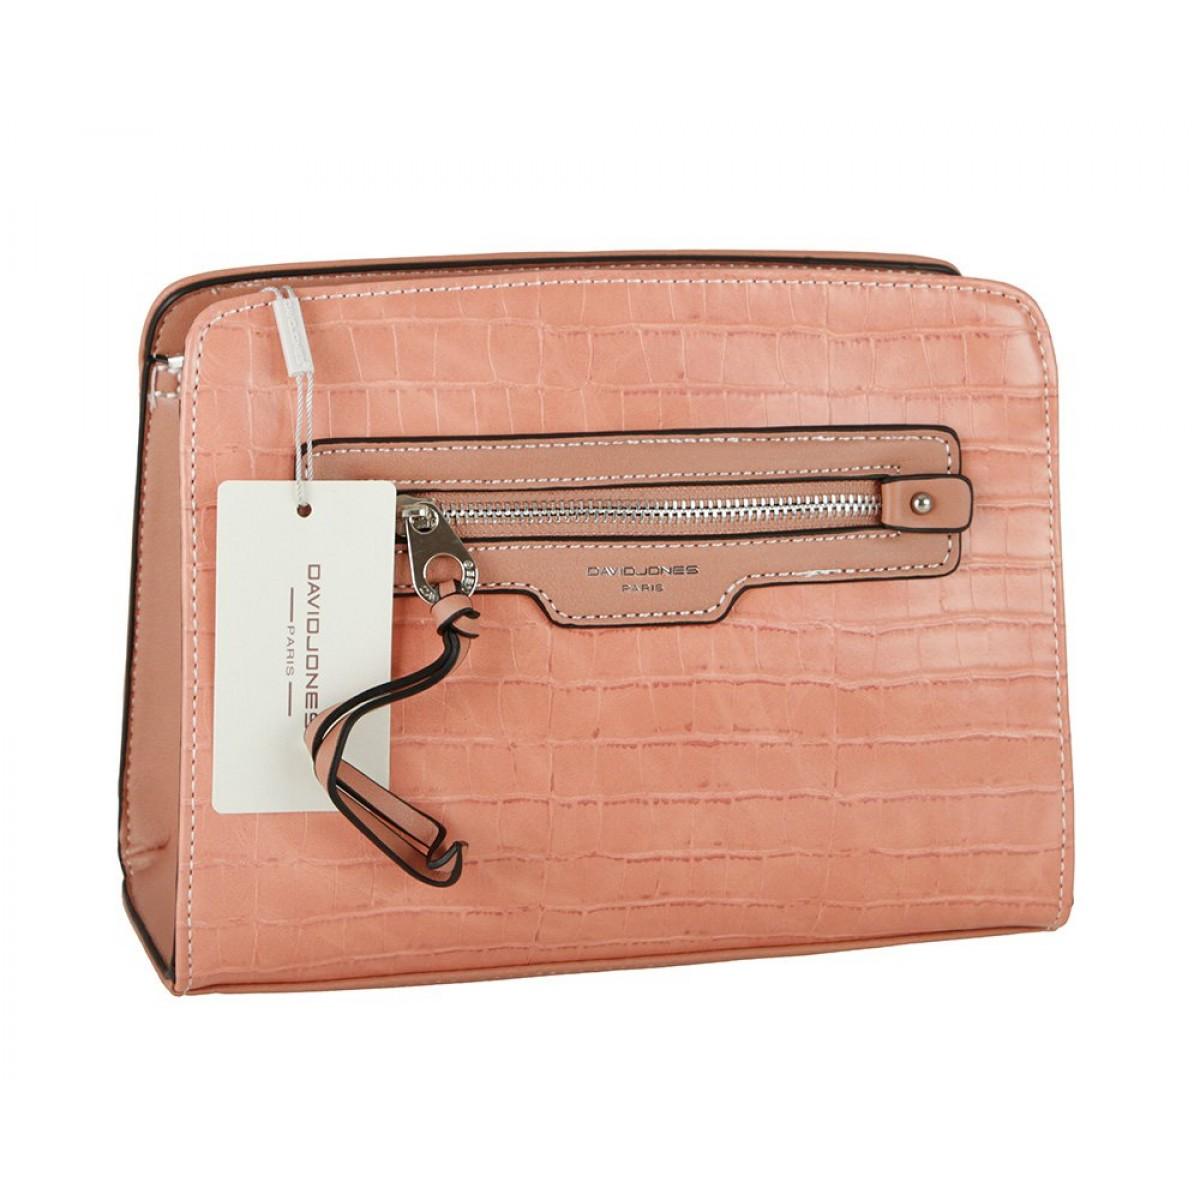 Жіноча сумка David Jones 6222-1 CORAL